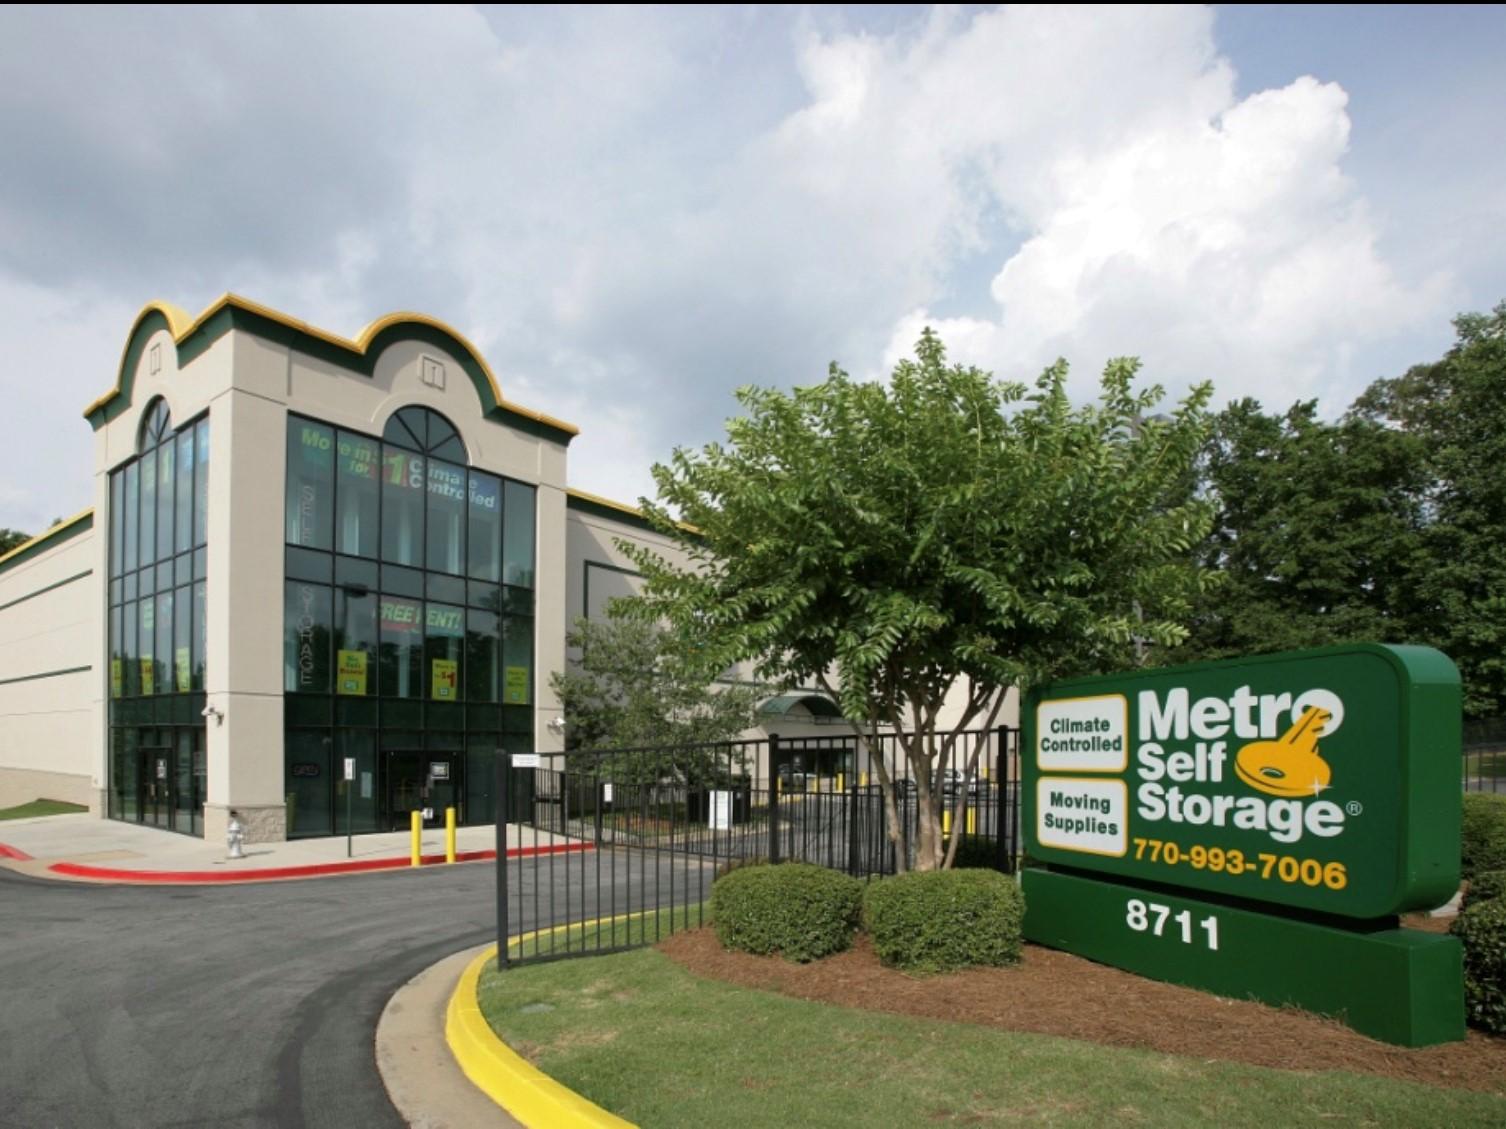 One of Metro's self storage properties in Atlanta. Image courtesy of Talonvest Capital Inc.